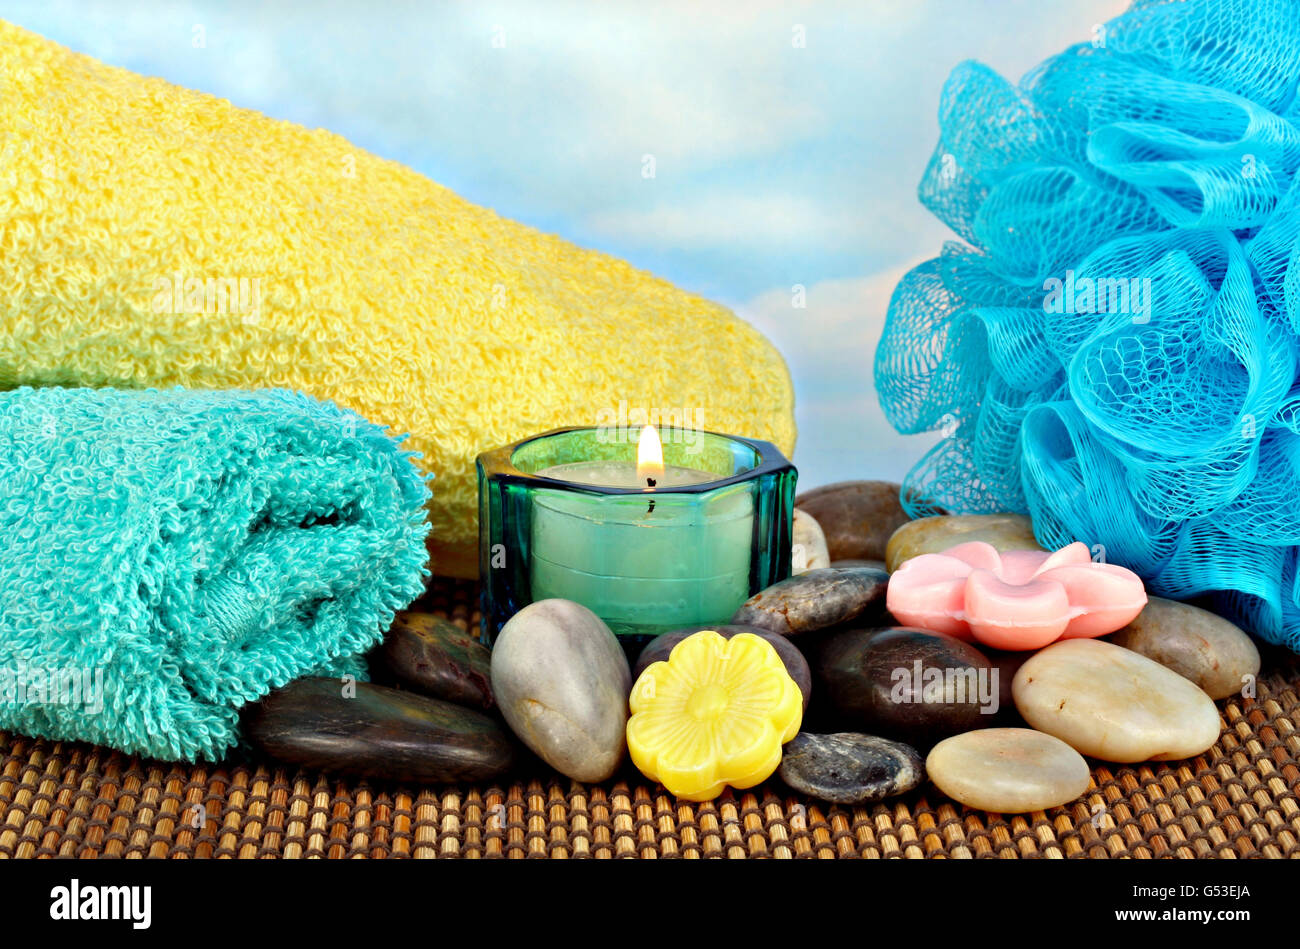 spa stones nobody stockfotos spa stones nobody bilder alamy. Black Bedroom Furniture Sets. Home Design Ideas